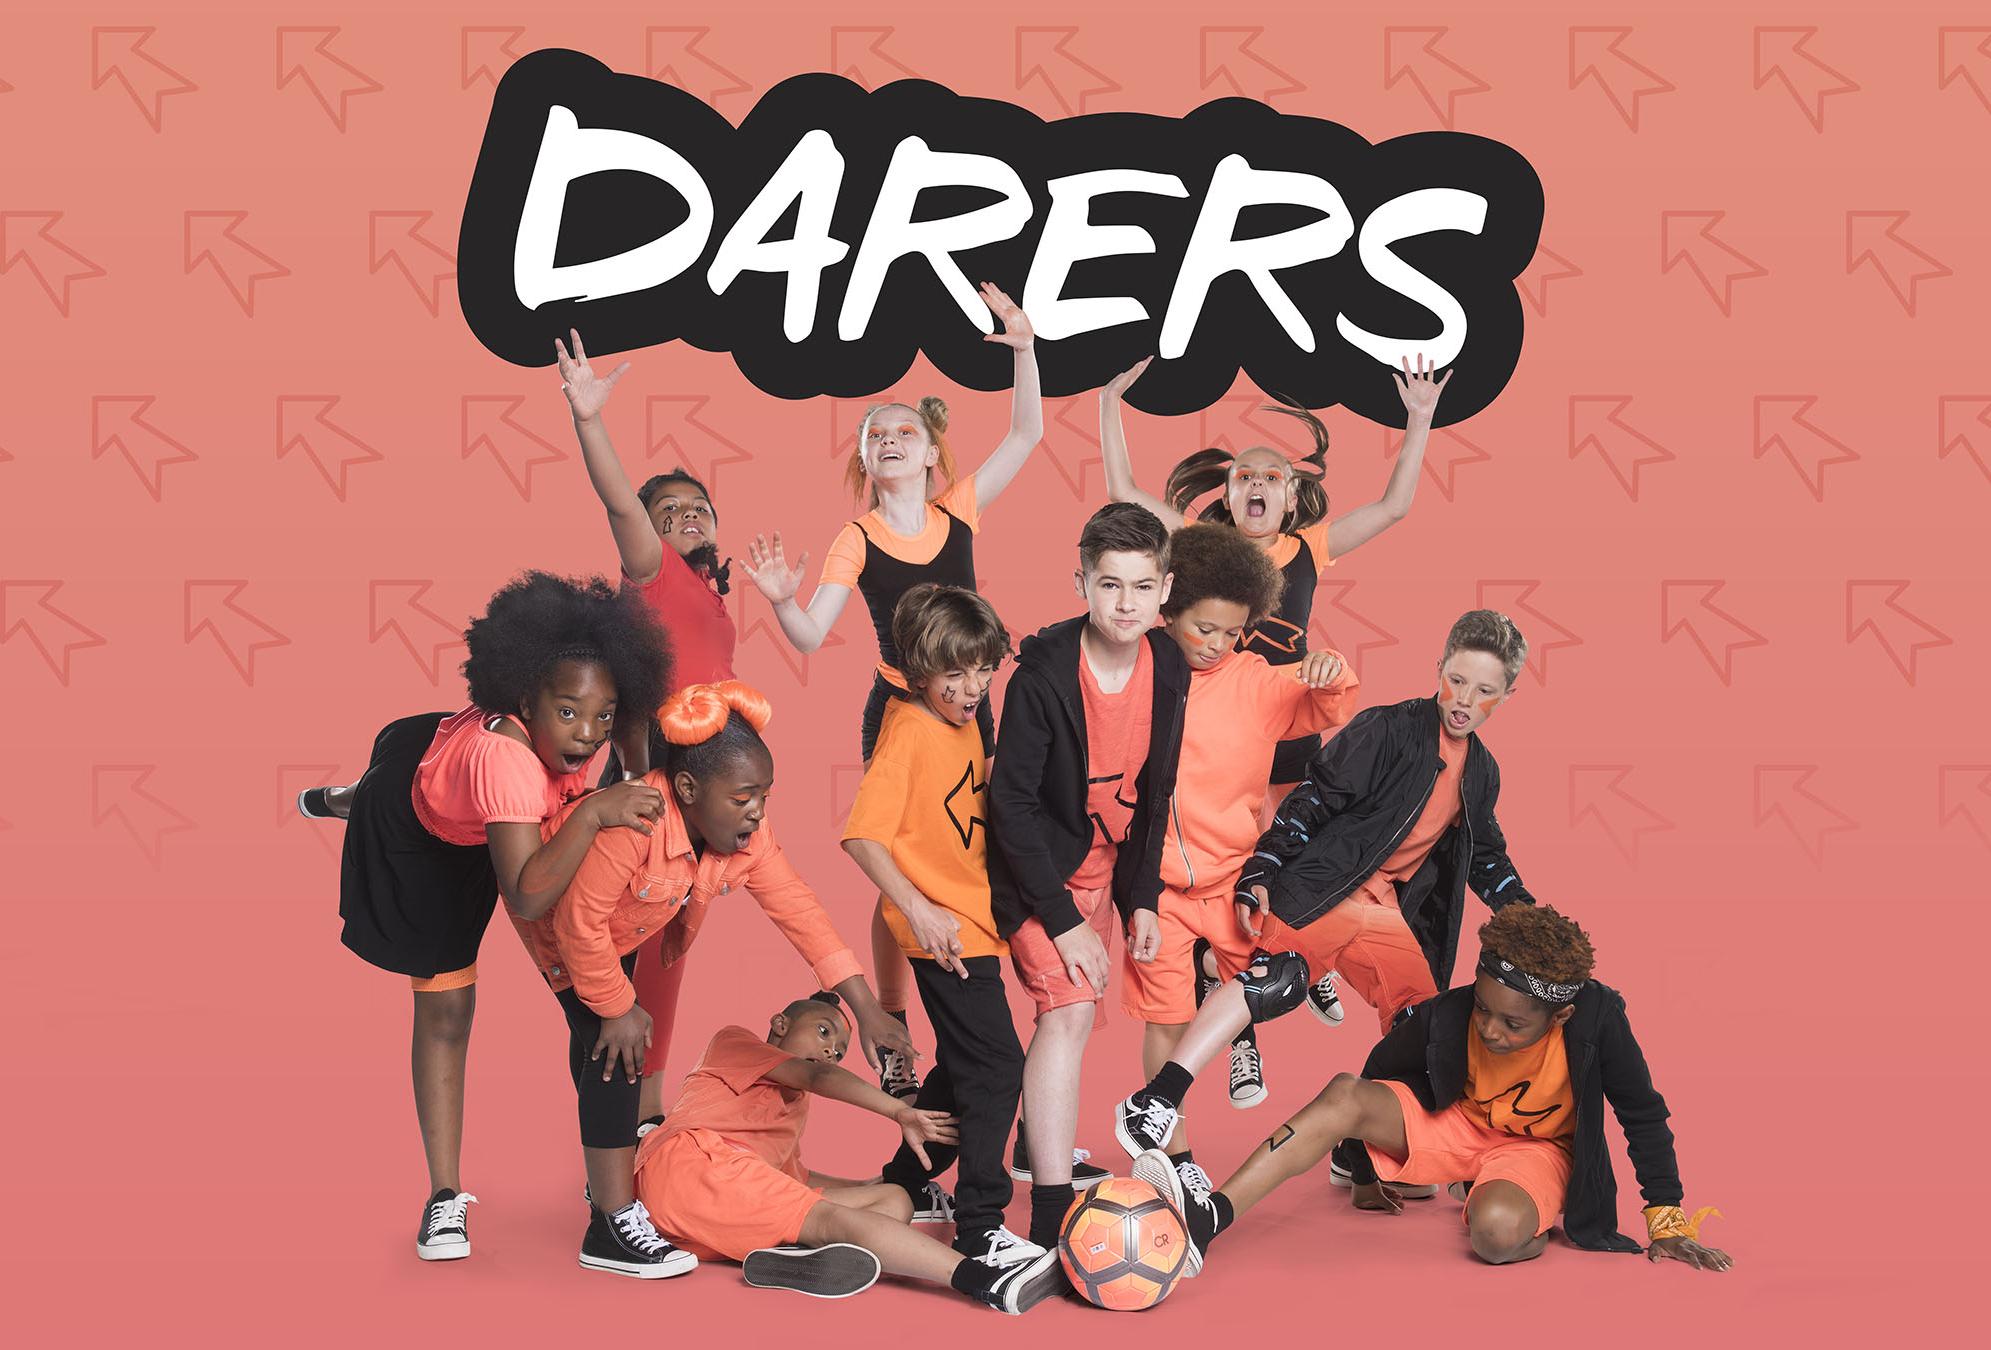 BBC Creative - CBBC Tribes - Darers